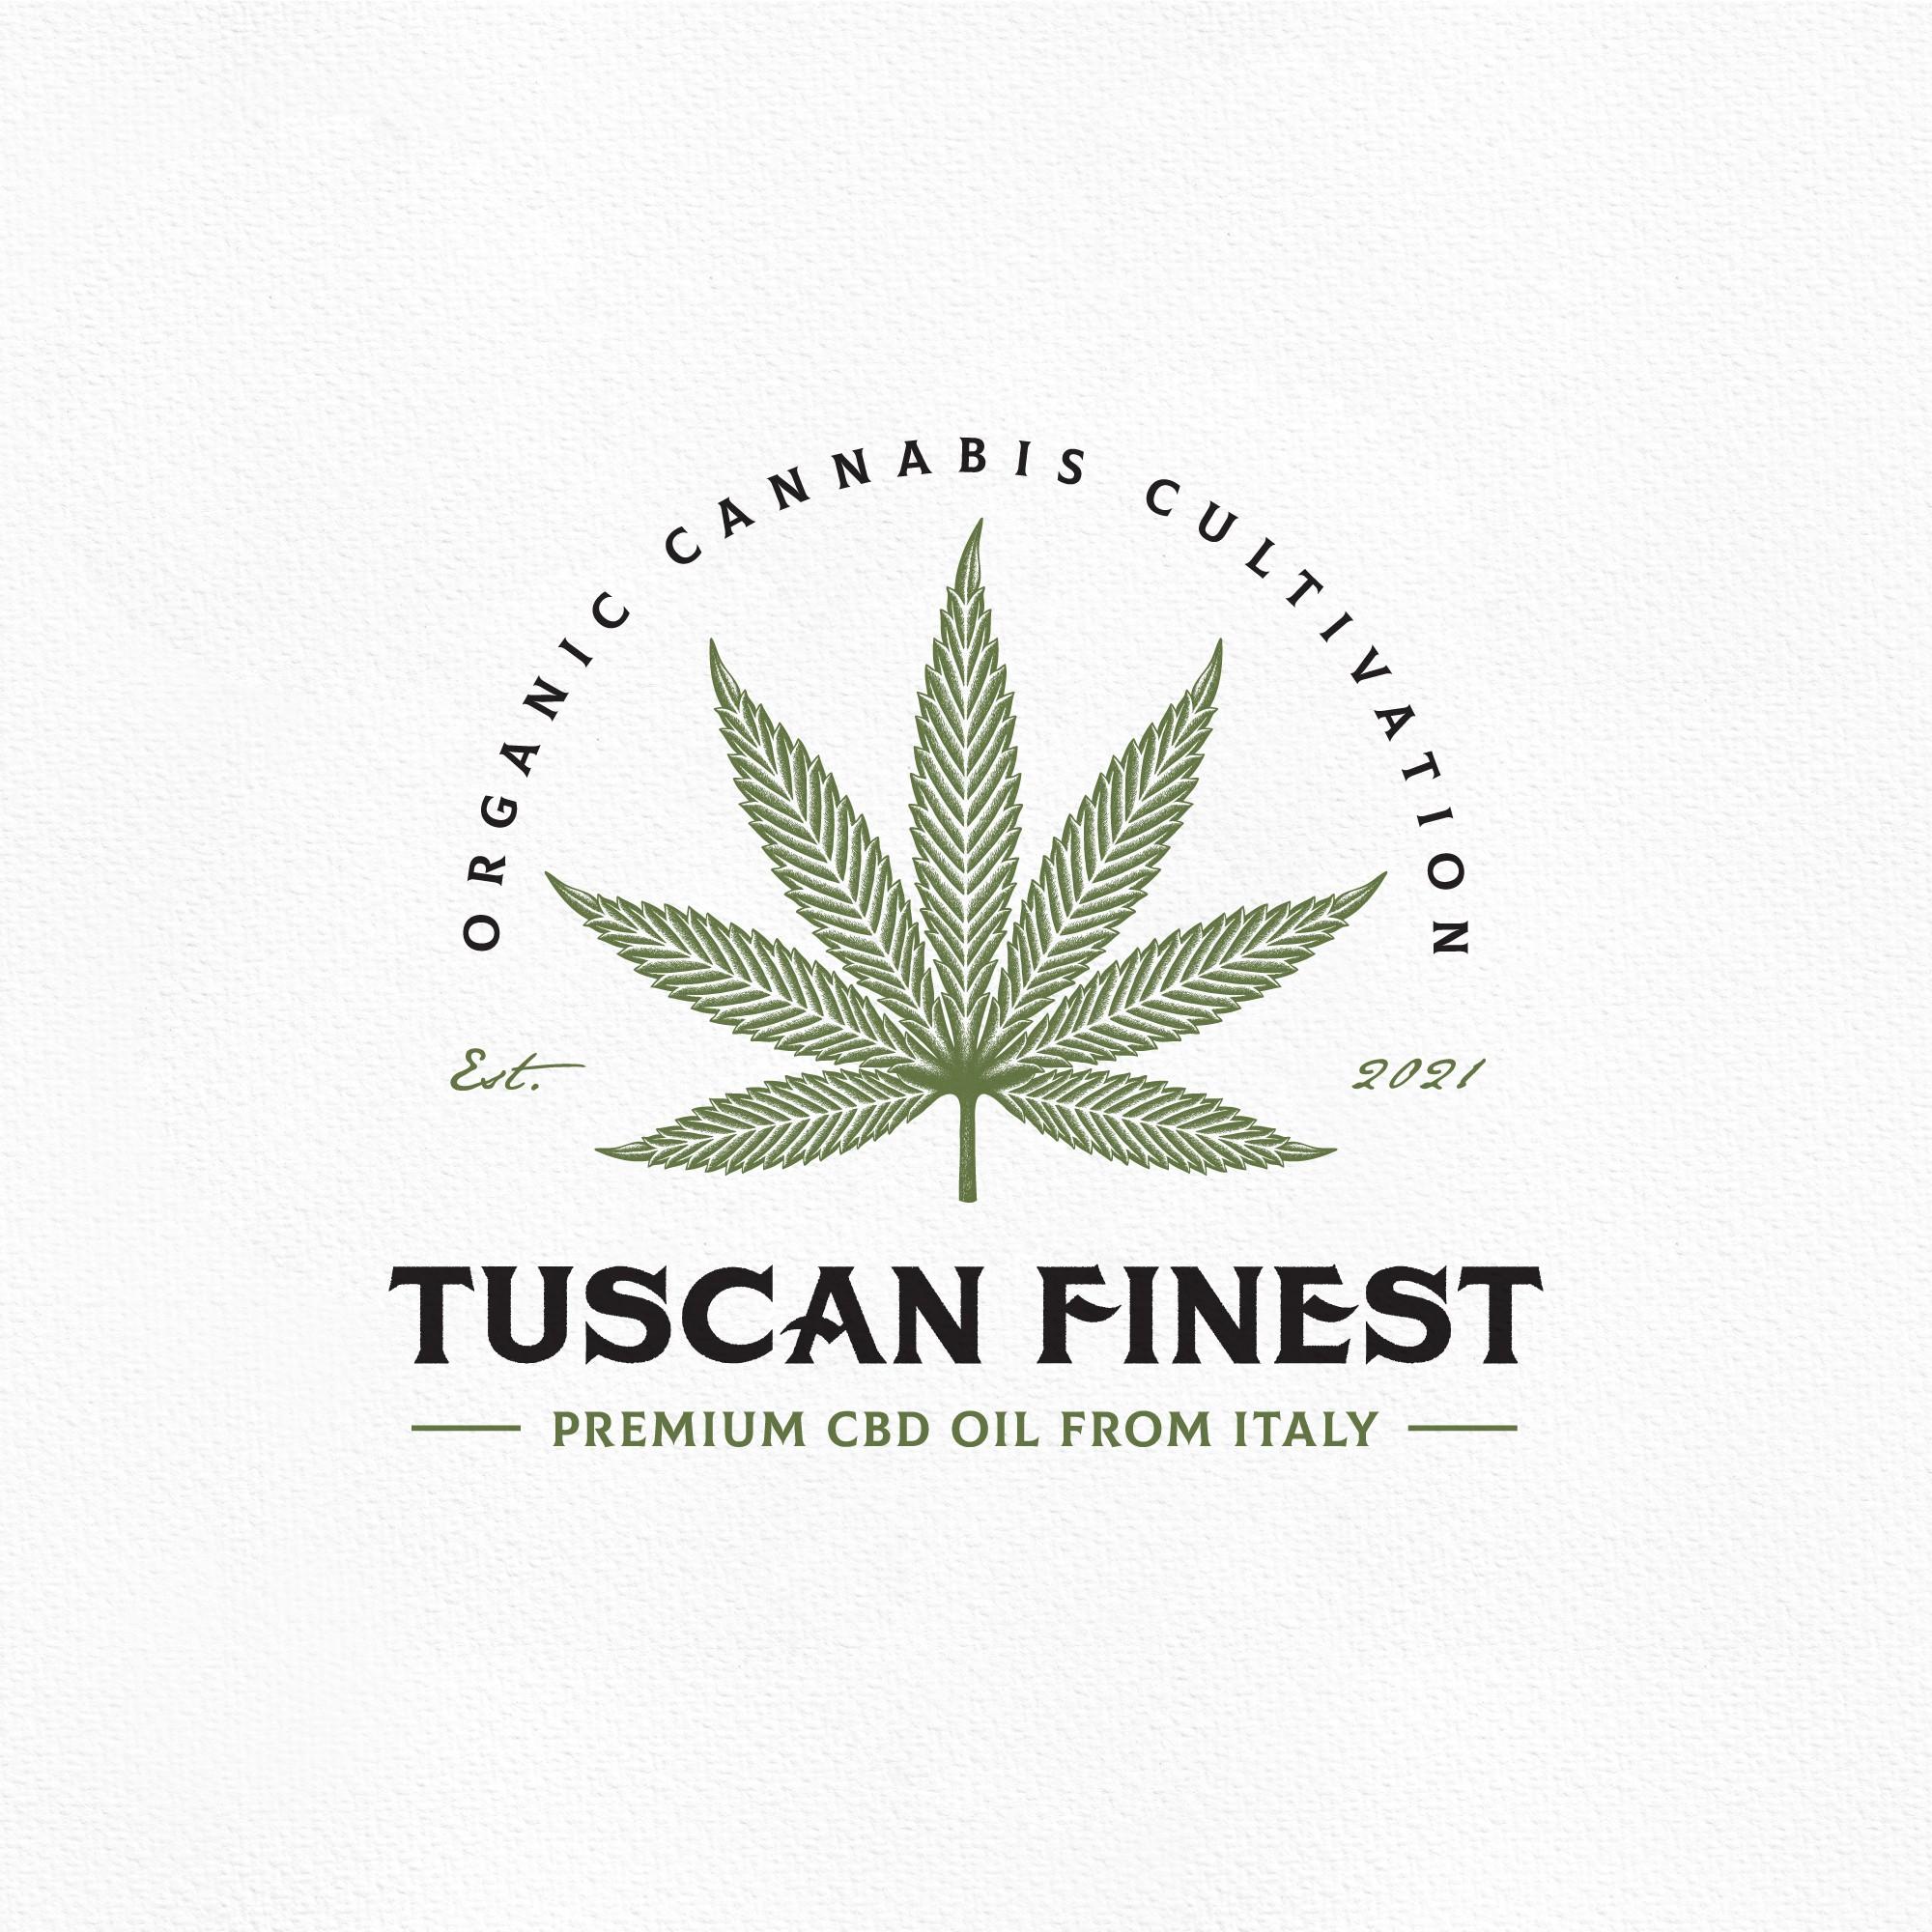 Tuscan Finest